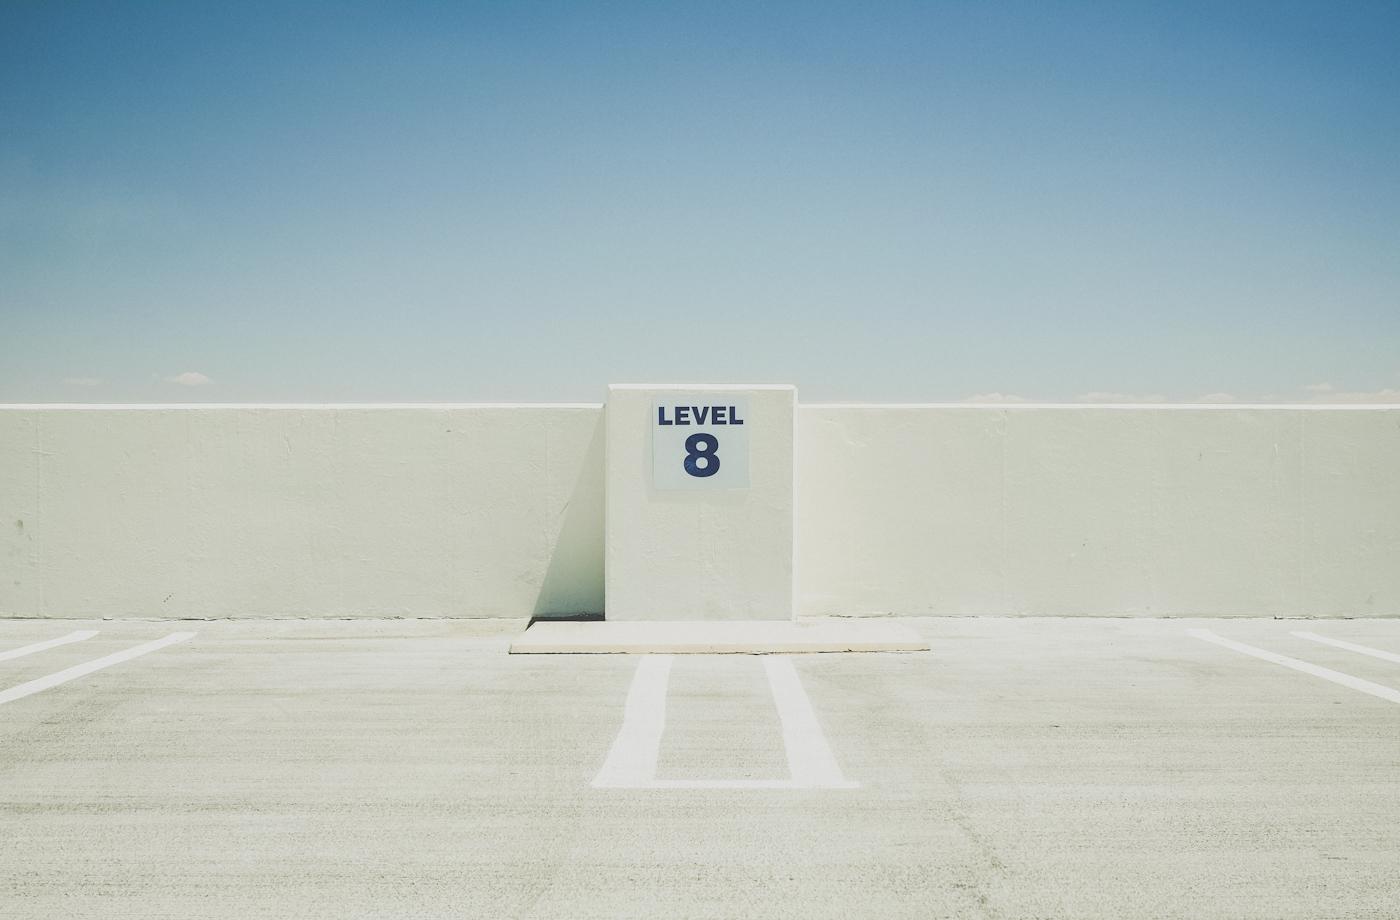 Level 8, pt III